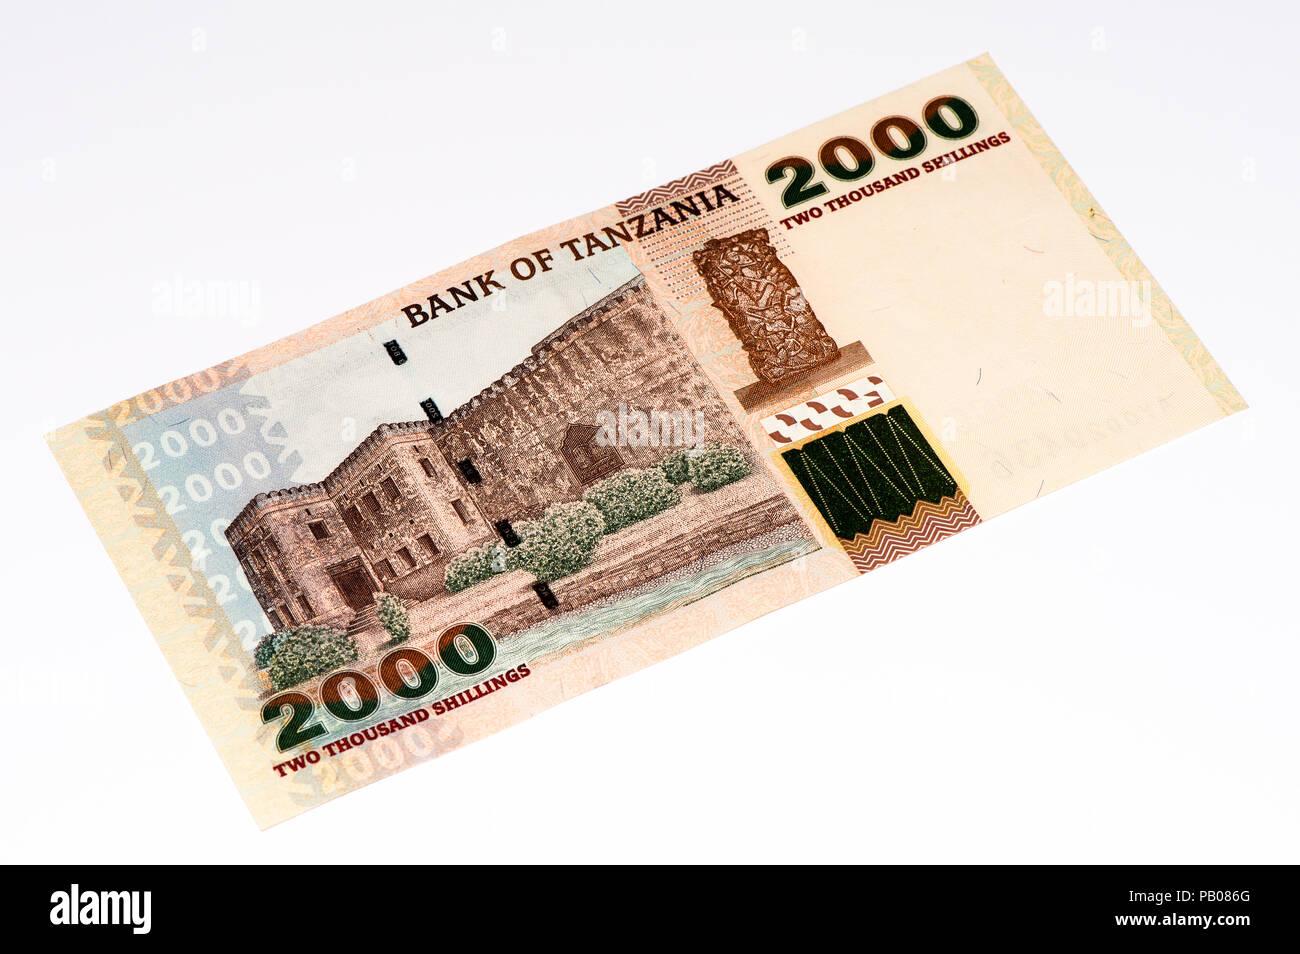 2000 Tanzanian shillings bank note. Tanzanian shilling is the national currency of Tanzania - Stock Image